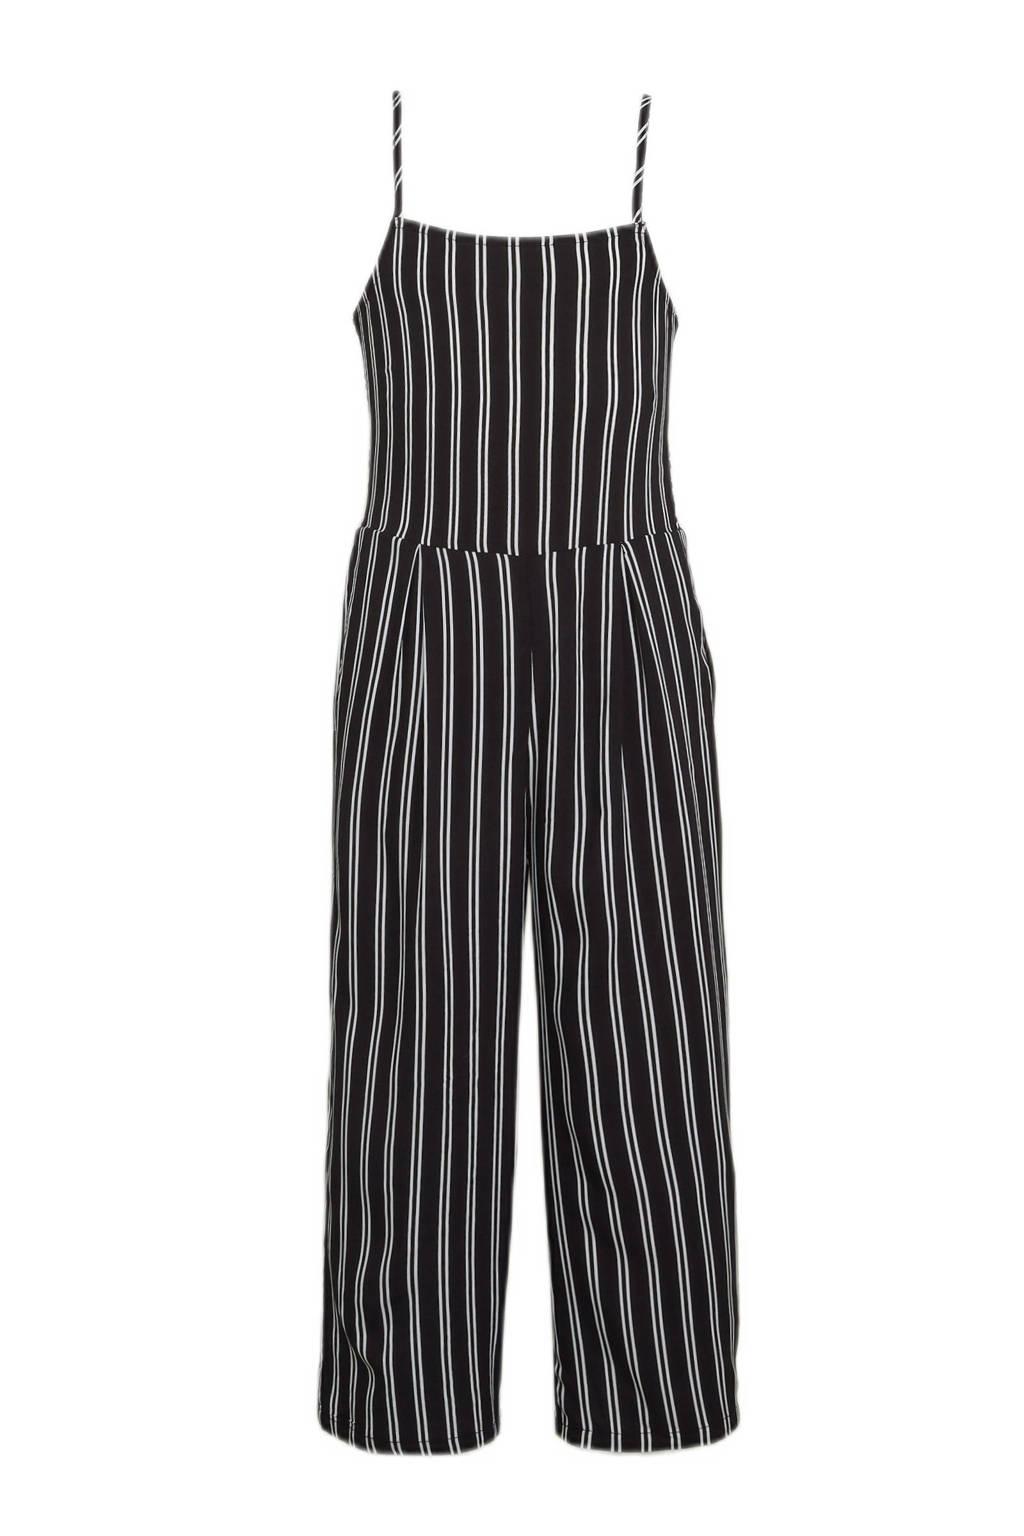 Ellos gestreepte jumpsuit Freya zwart/wit, Zwart/wit